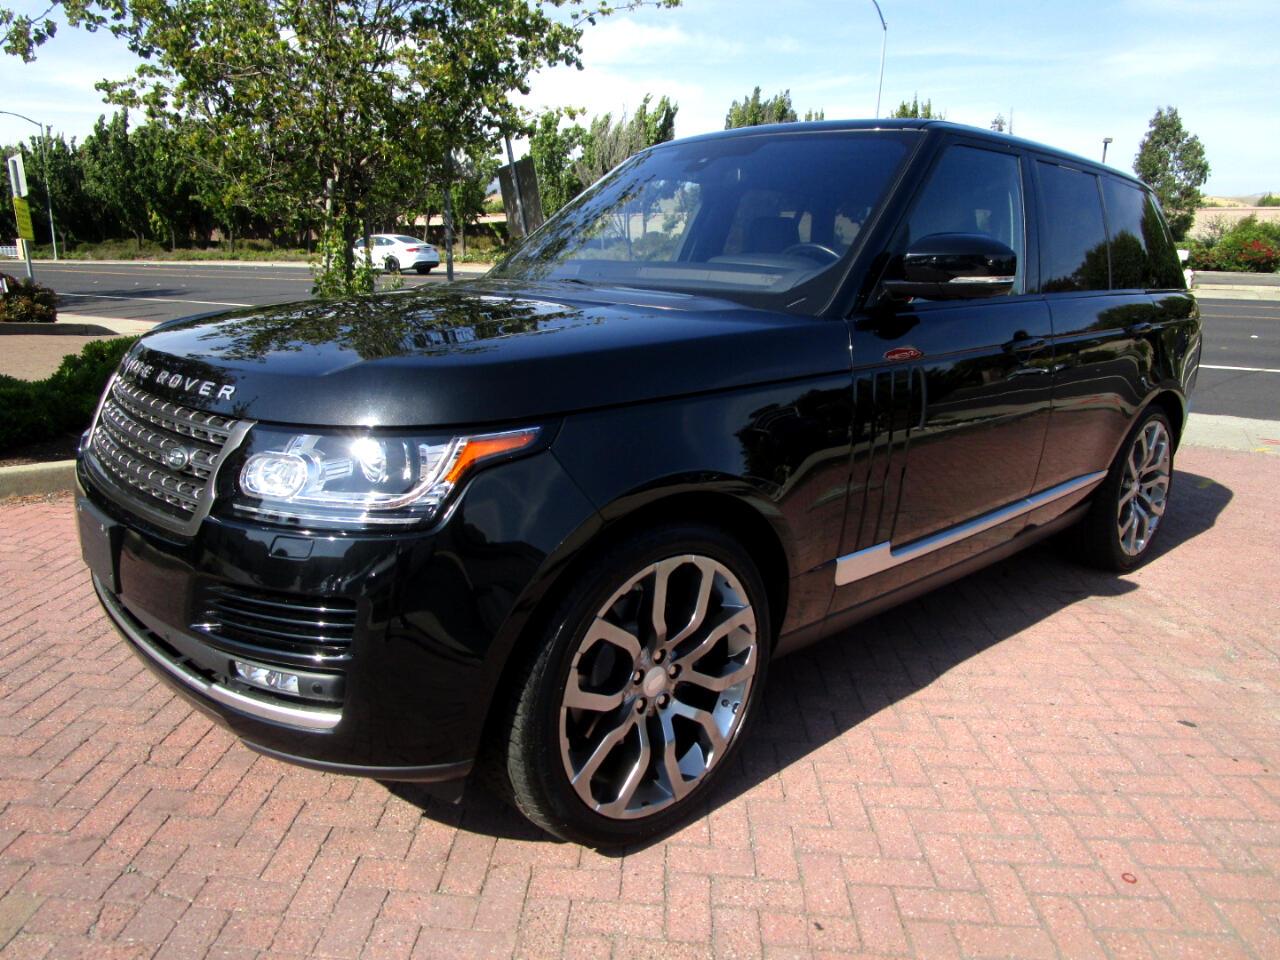 2016 Land Rover Range Rover SUPERCHARGED 3.0 LITER V6*BLIND SPOT*HEAT SEATS*PA